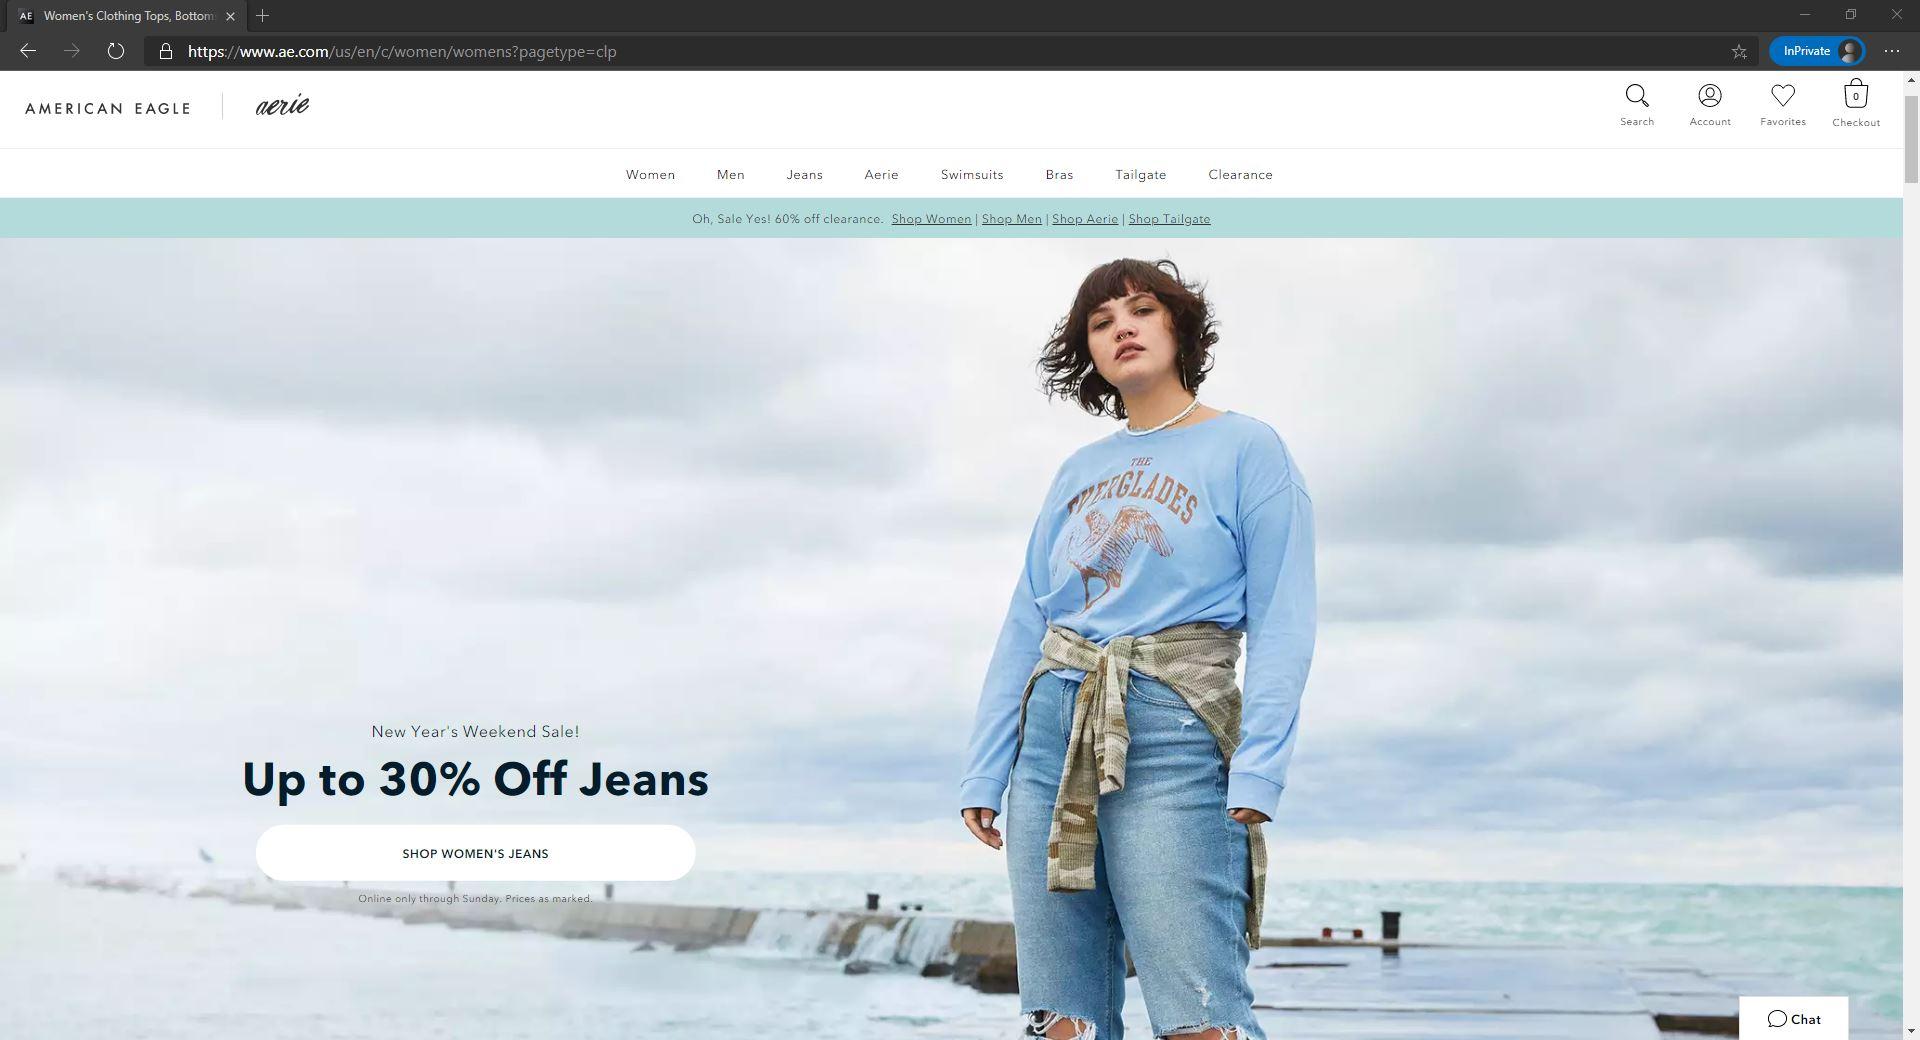 American Eagle website